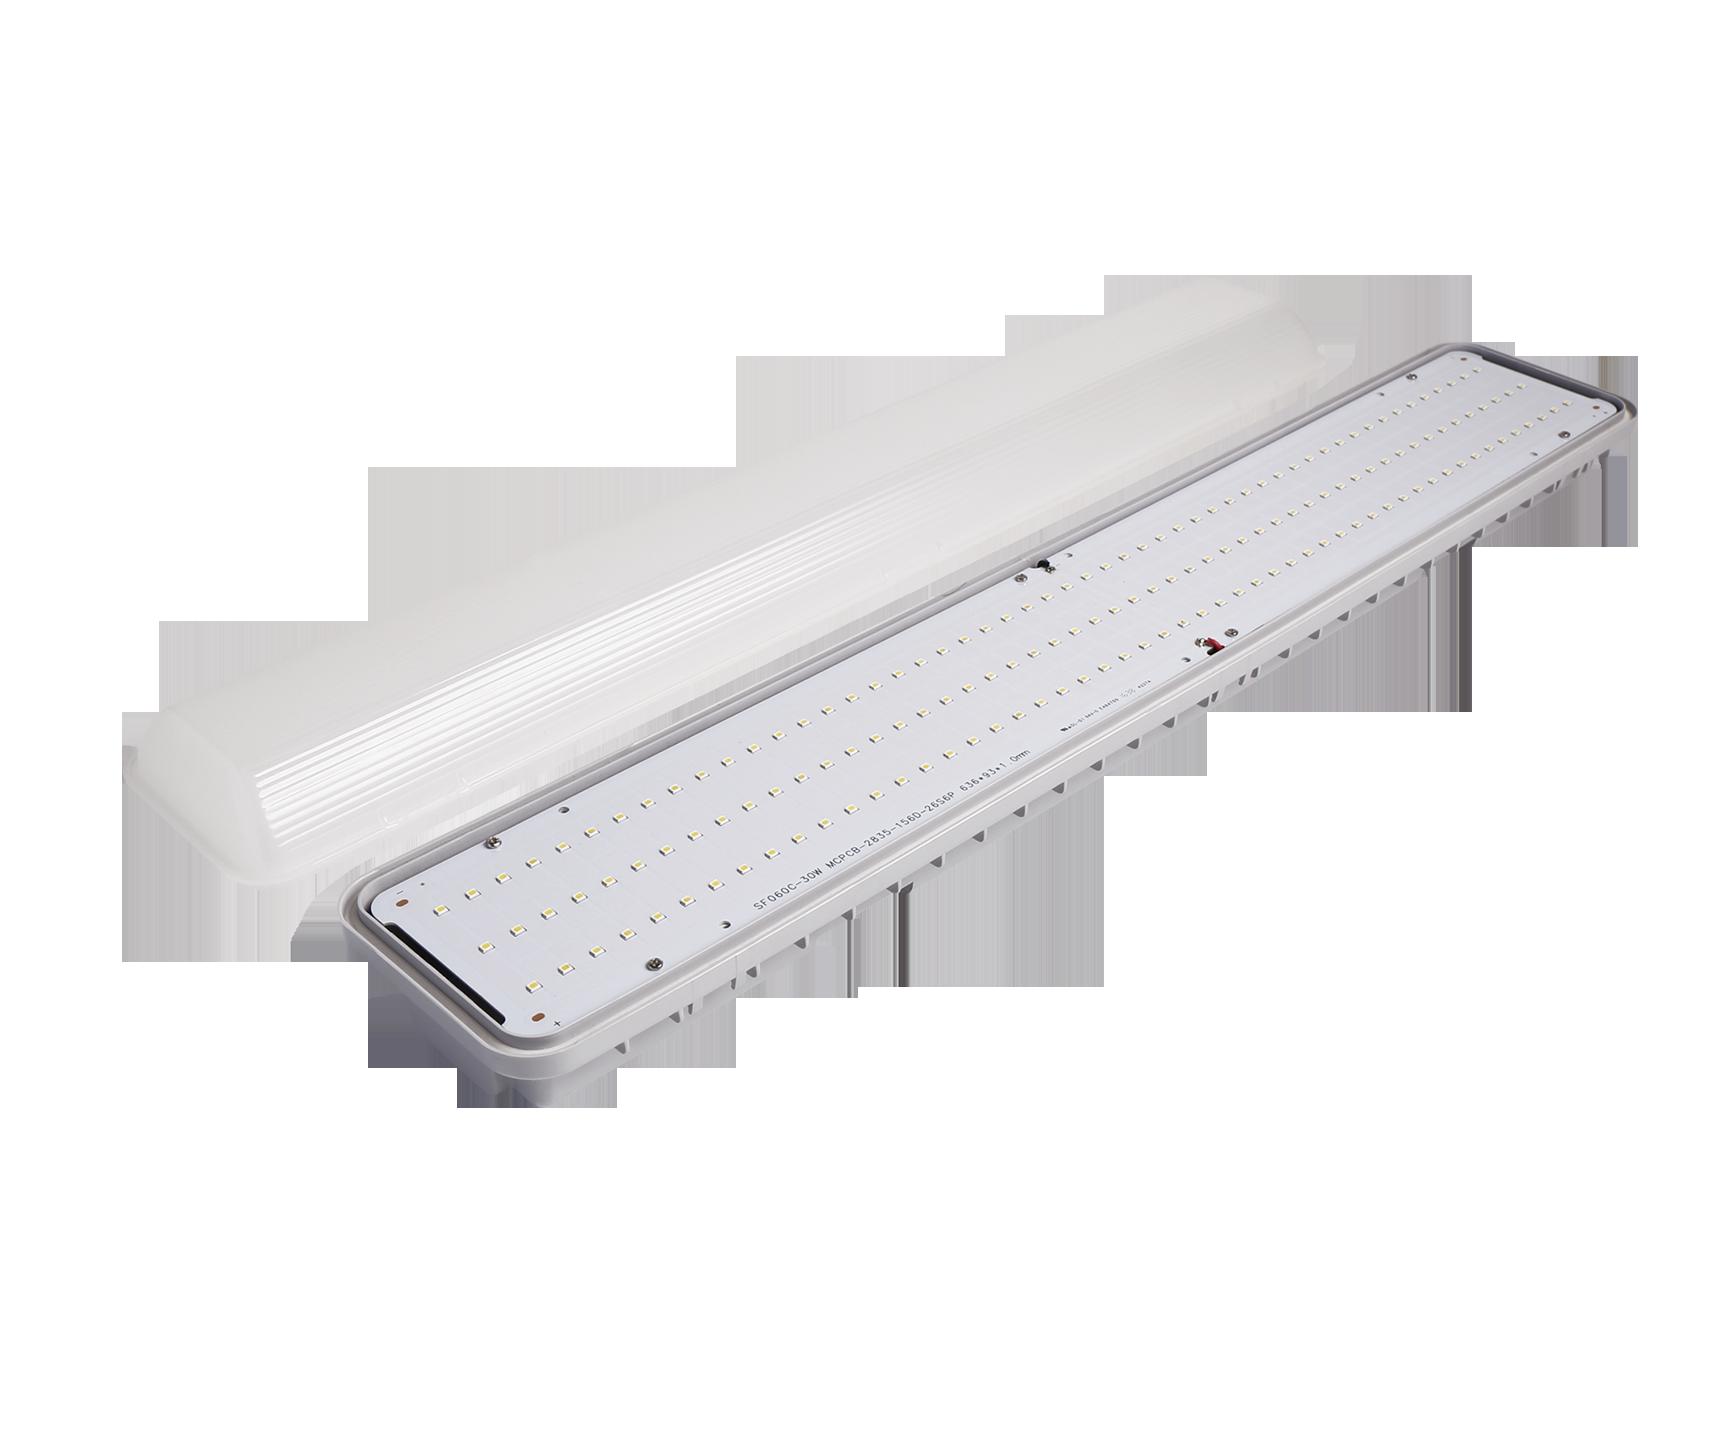 SMD2835 Tri-proof LED Tube Light 30W 60W 68W LED Lamp Bulb White For home Office Hotel 2FT 4FT 5FT